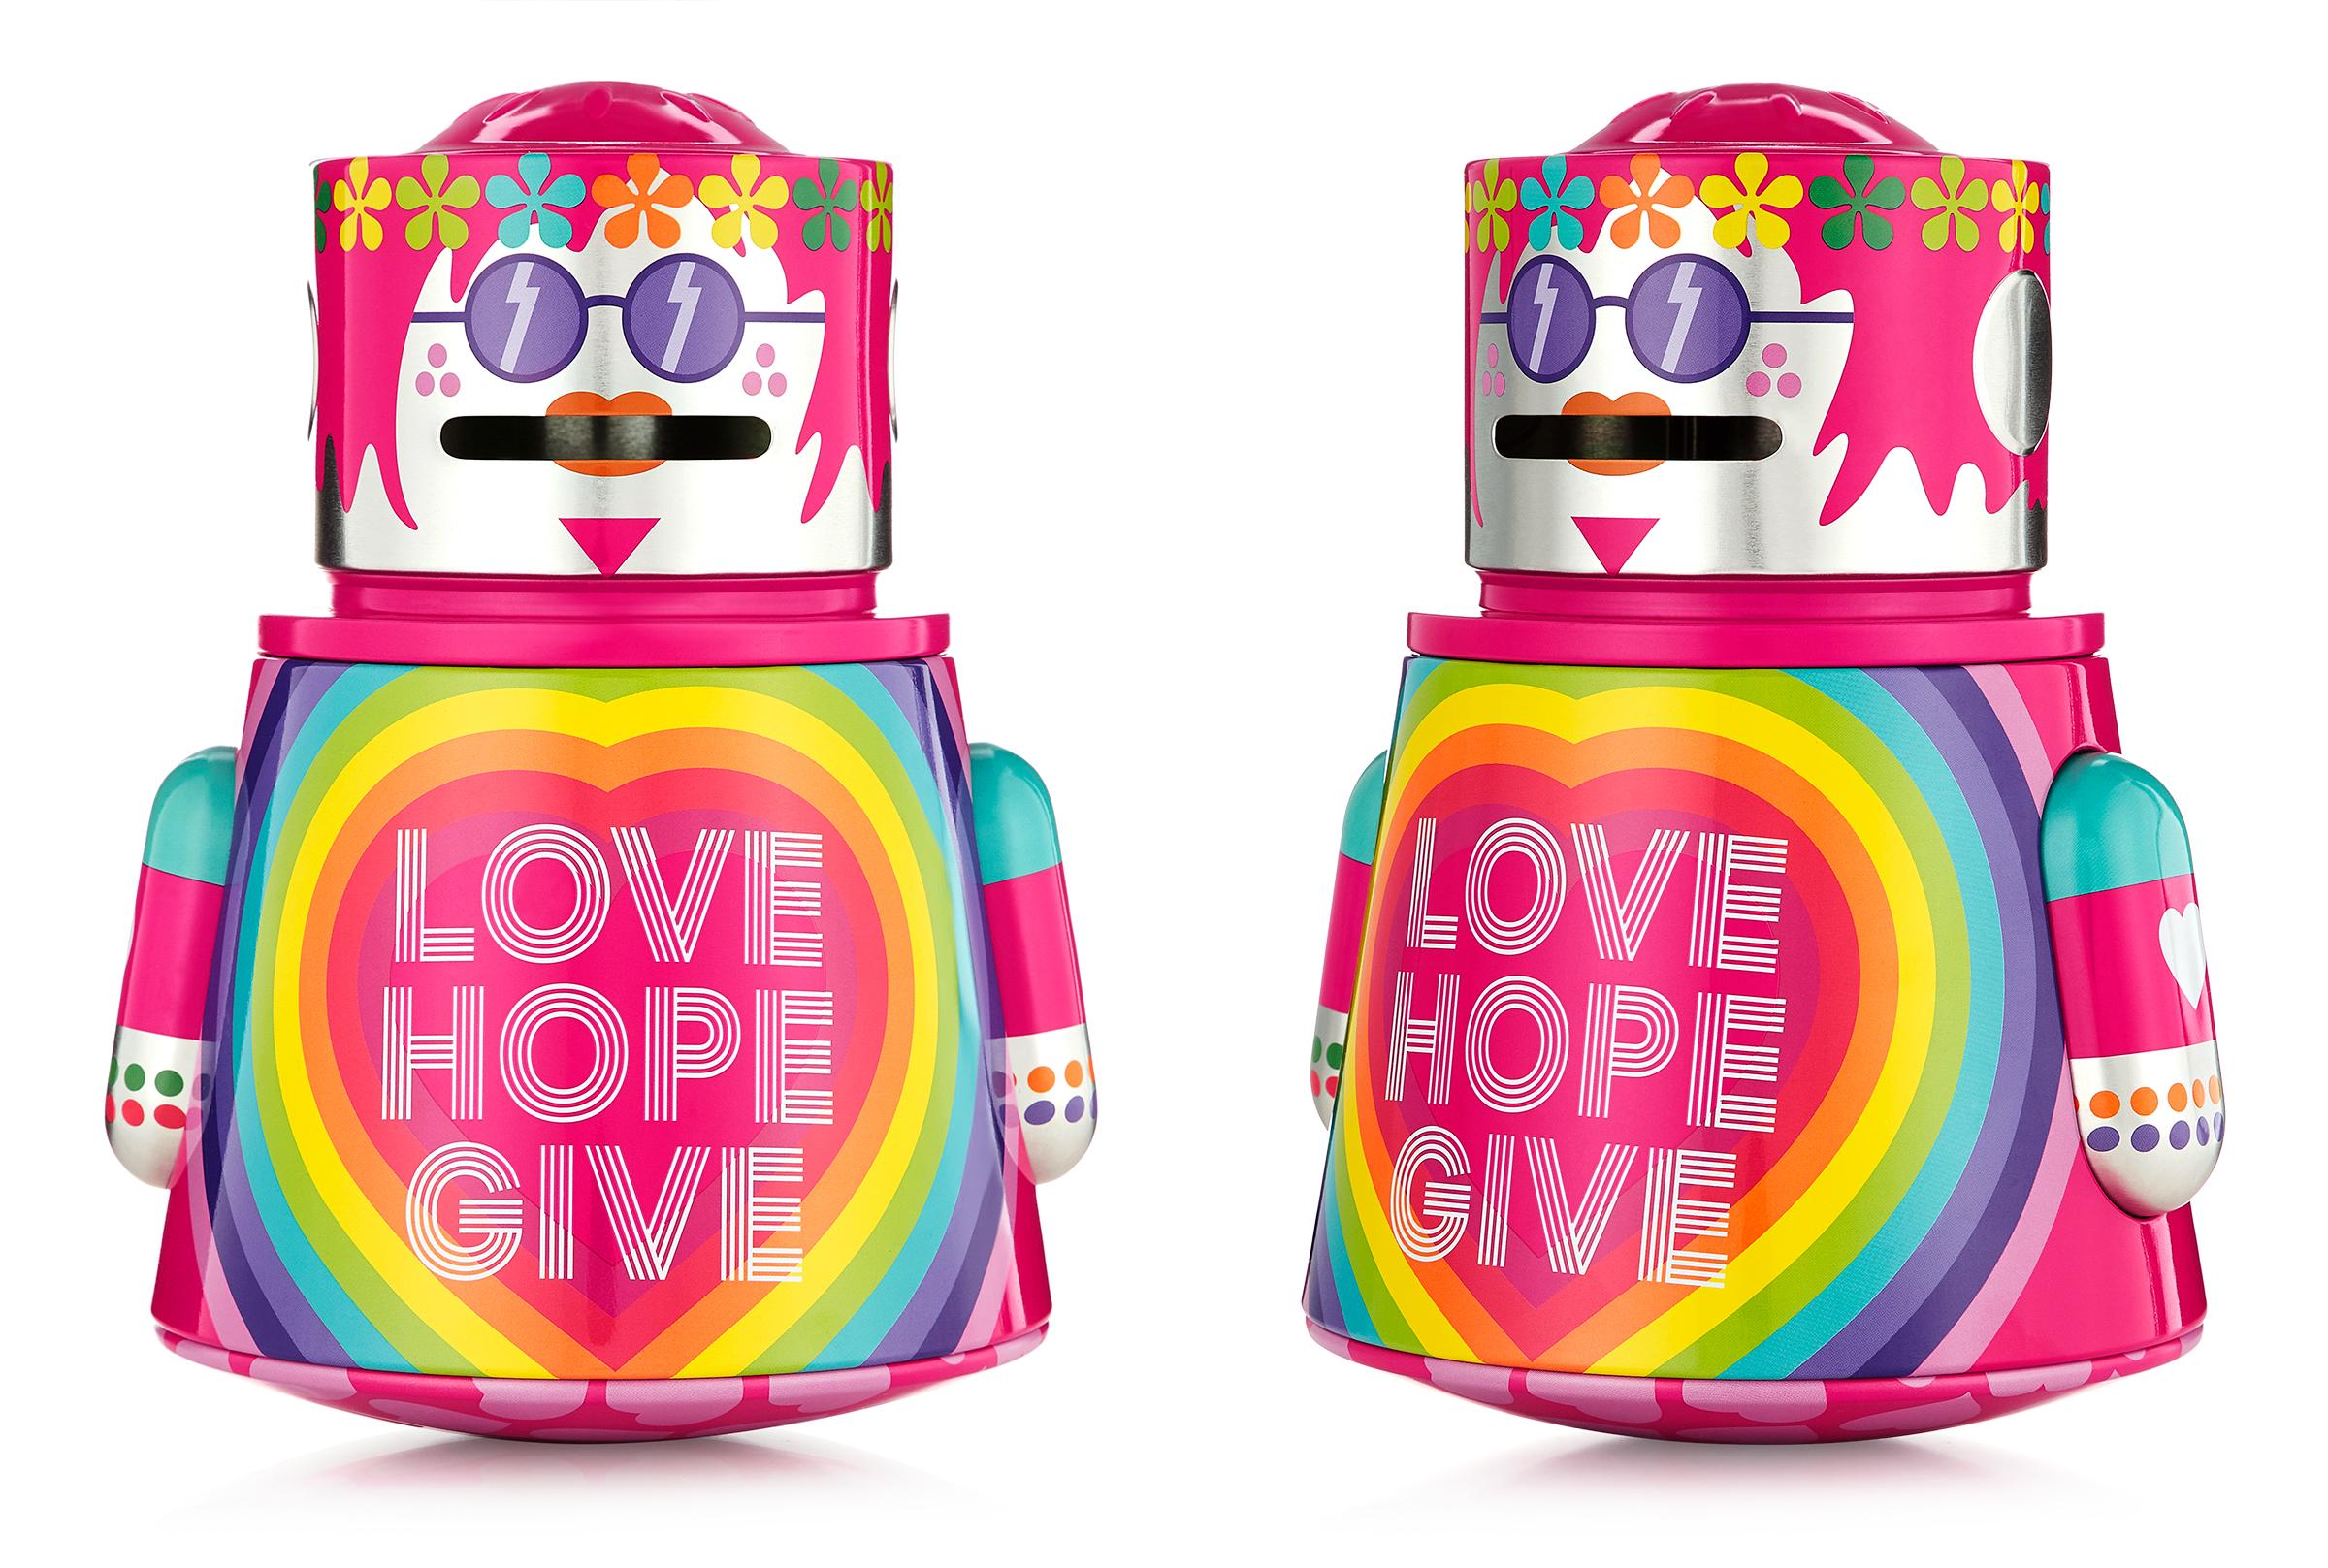 RENEE MELO LTD THE BODY SHOP LOVE ROBOT-01